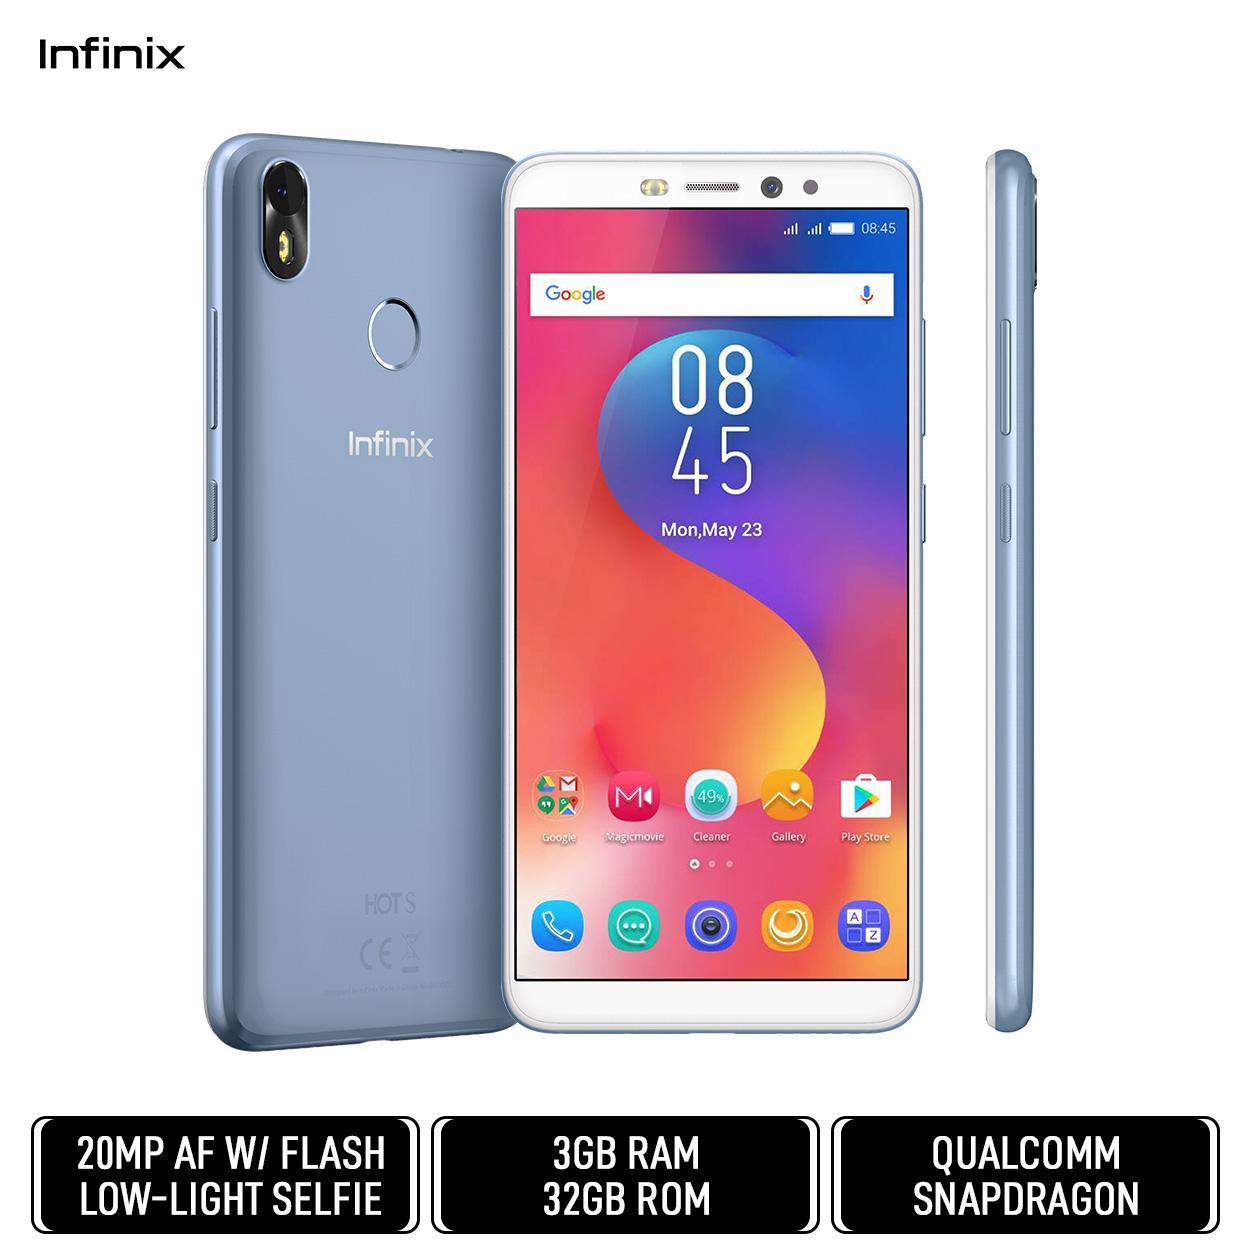 Infinix Philippines: Infinix price List - Infinix Phones for sale